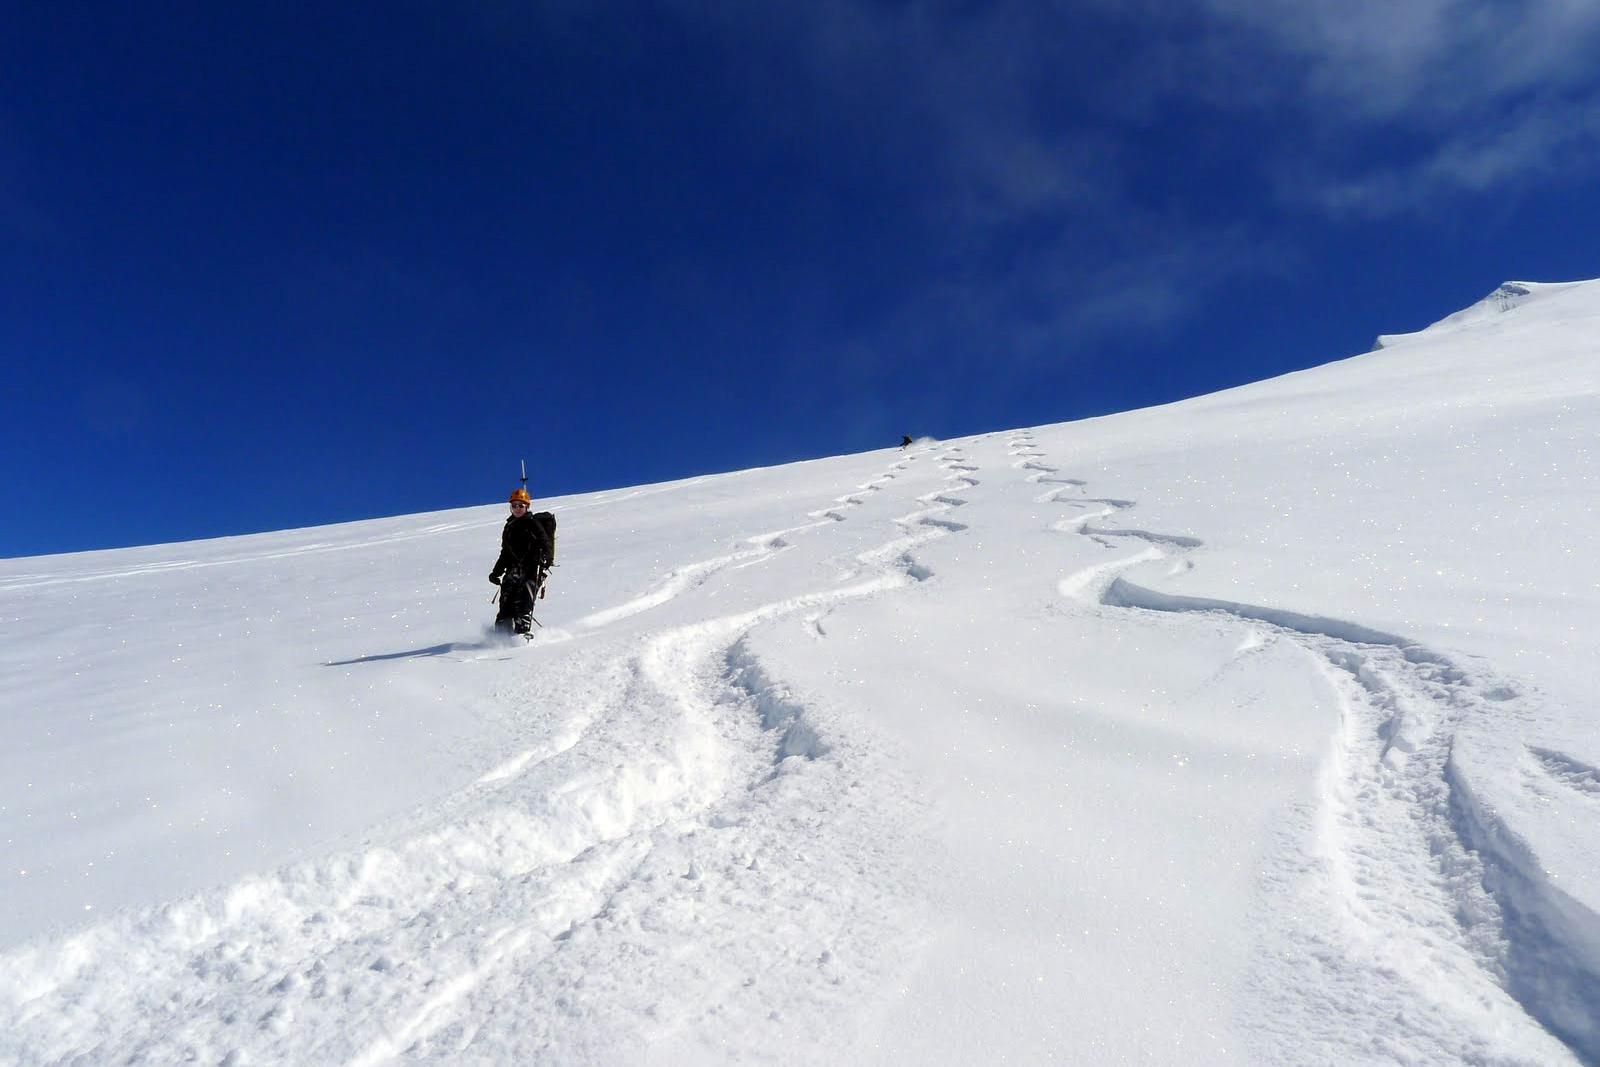 Calendrier sorties - Nivologie et ski de rando